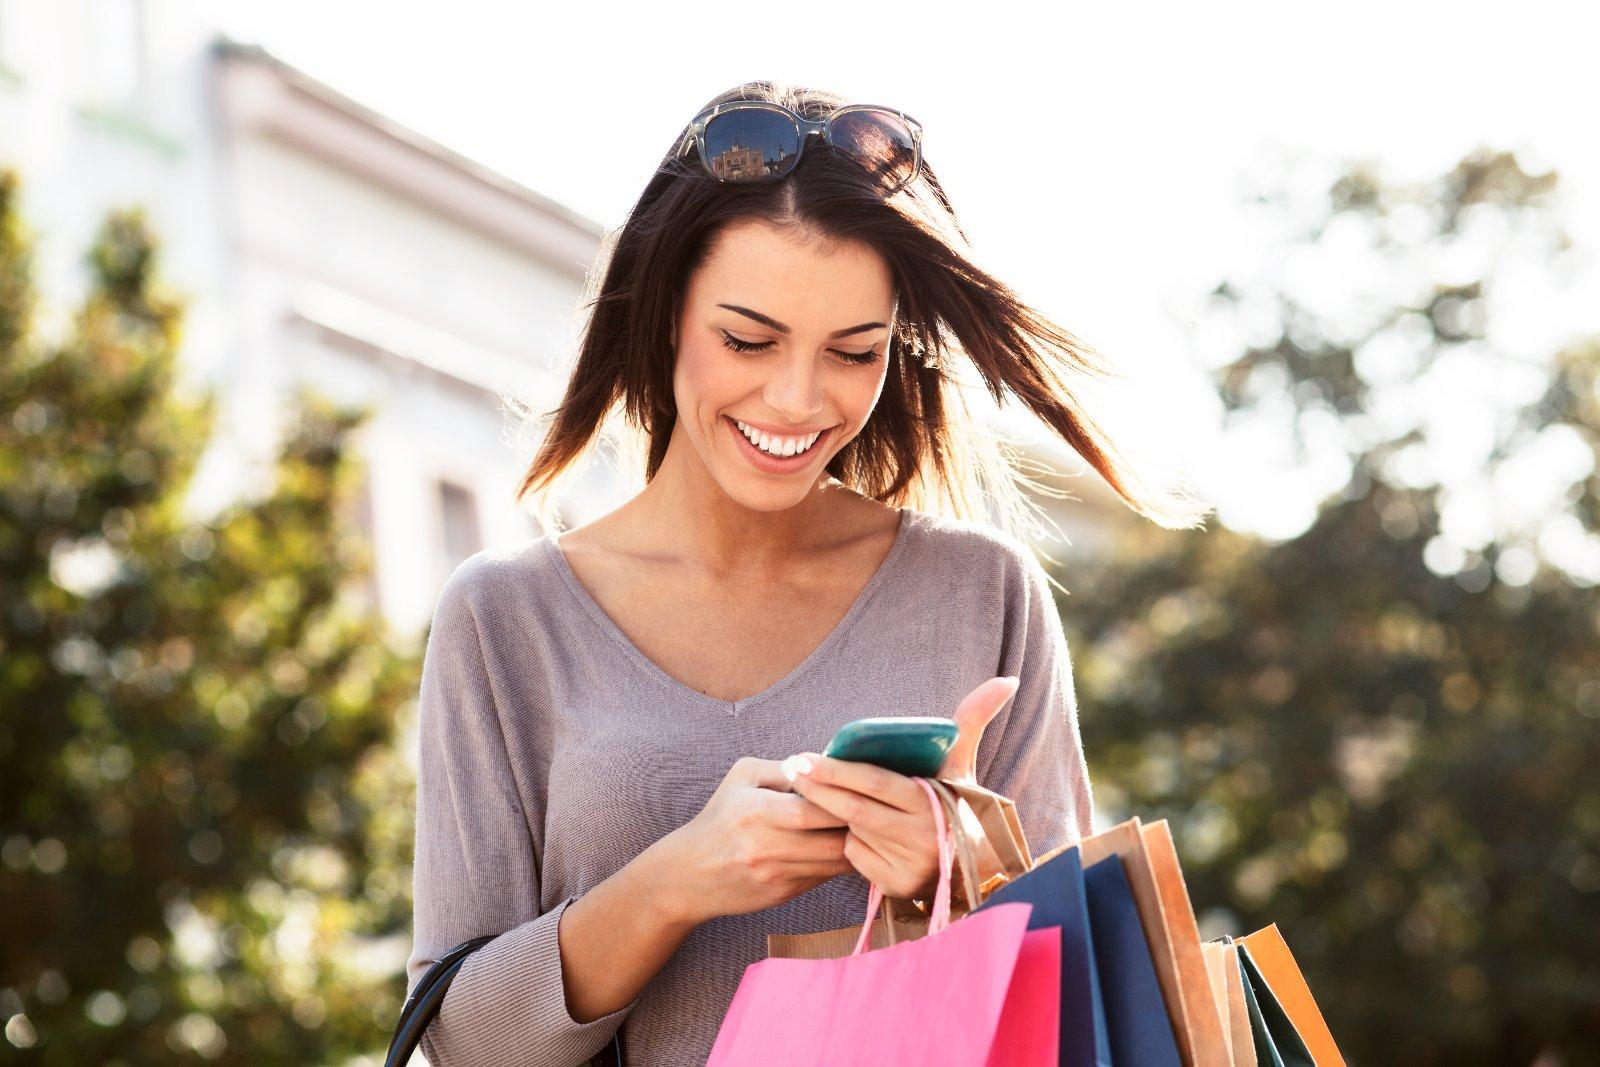 Effizientere Verkaufsförderung durch Mobile-Coupons